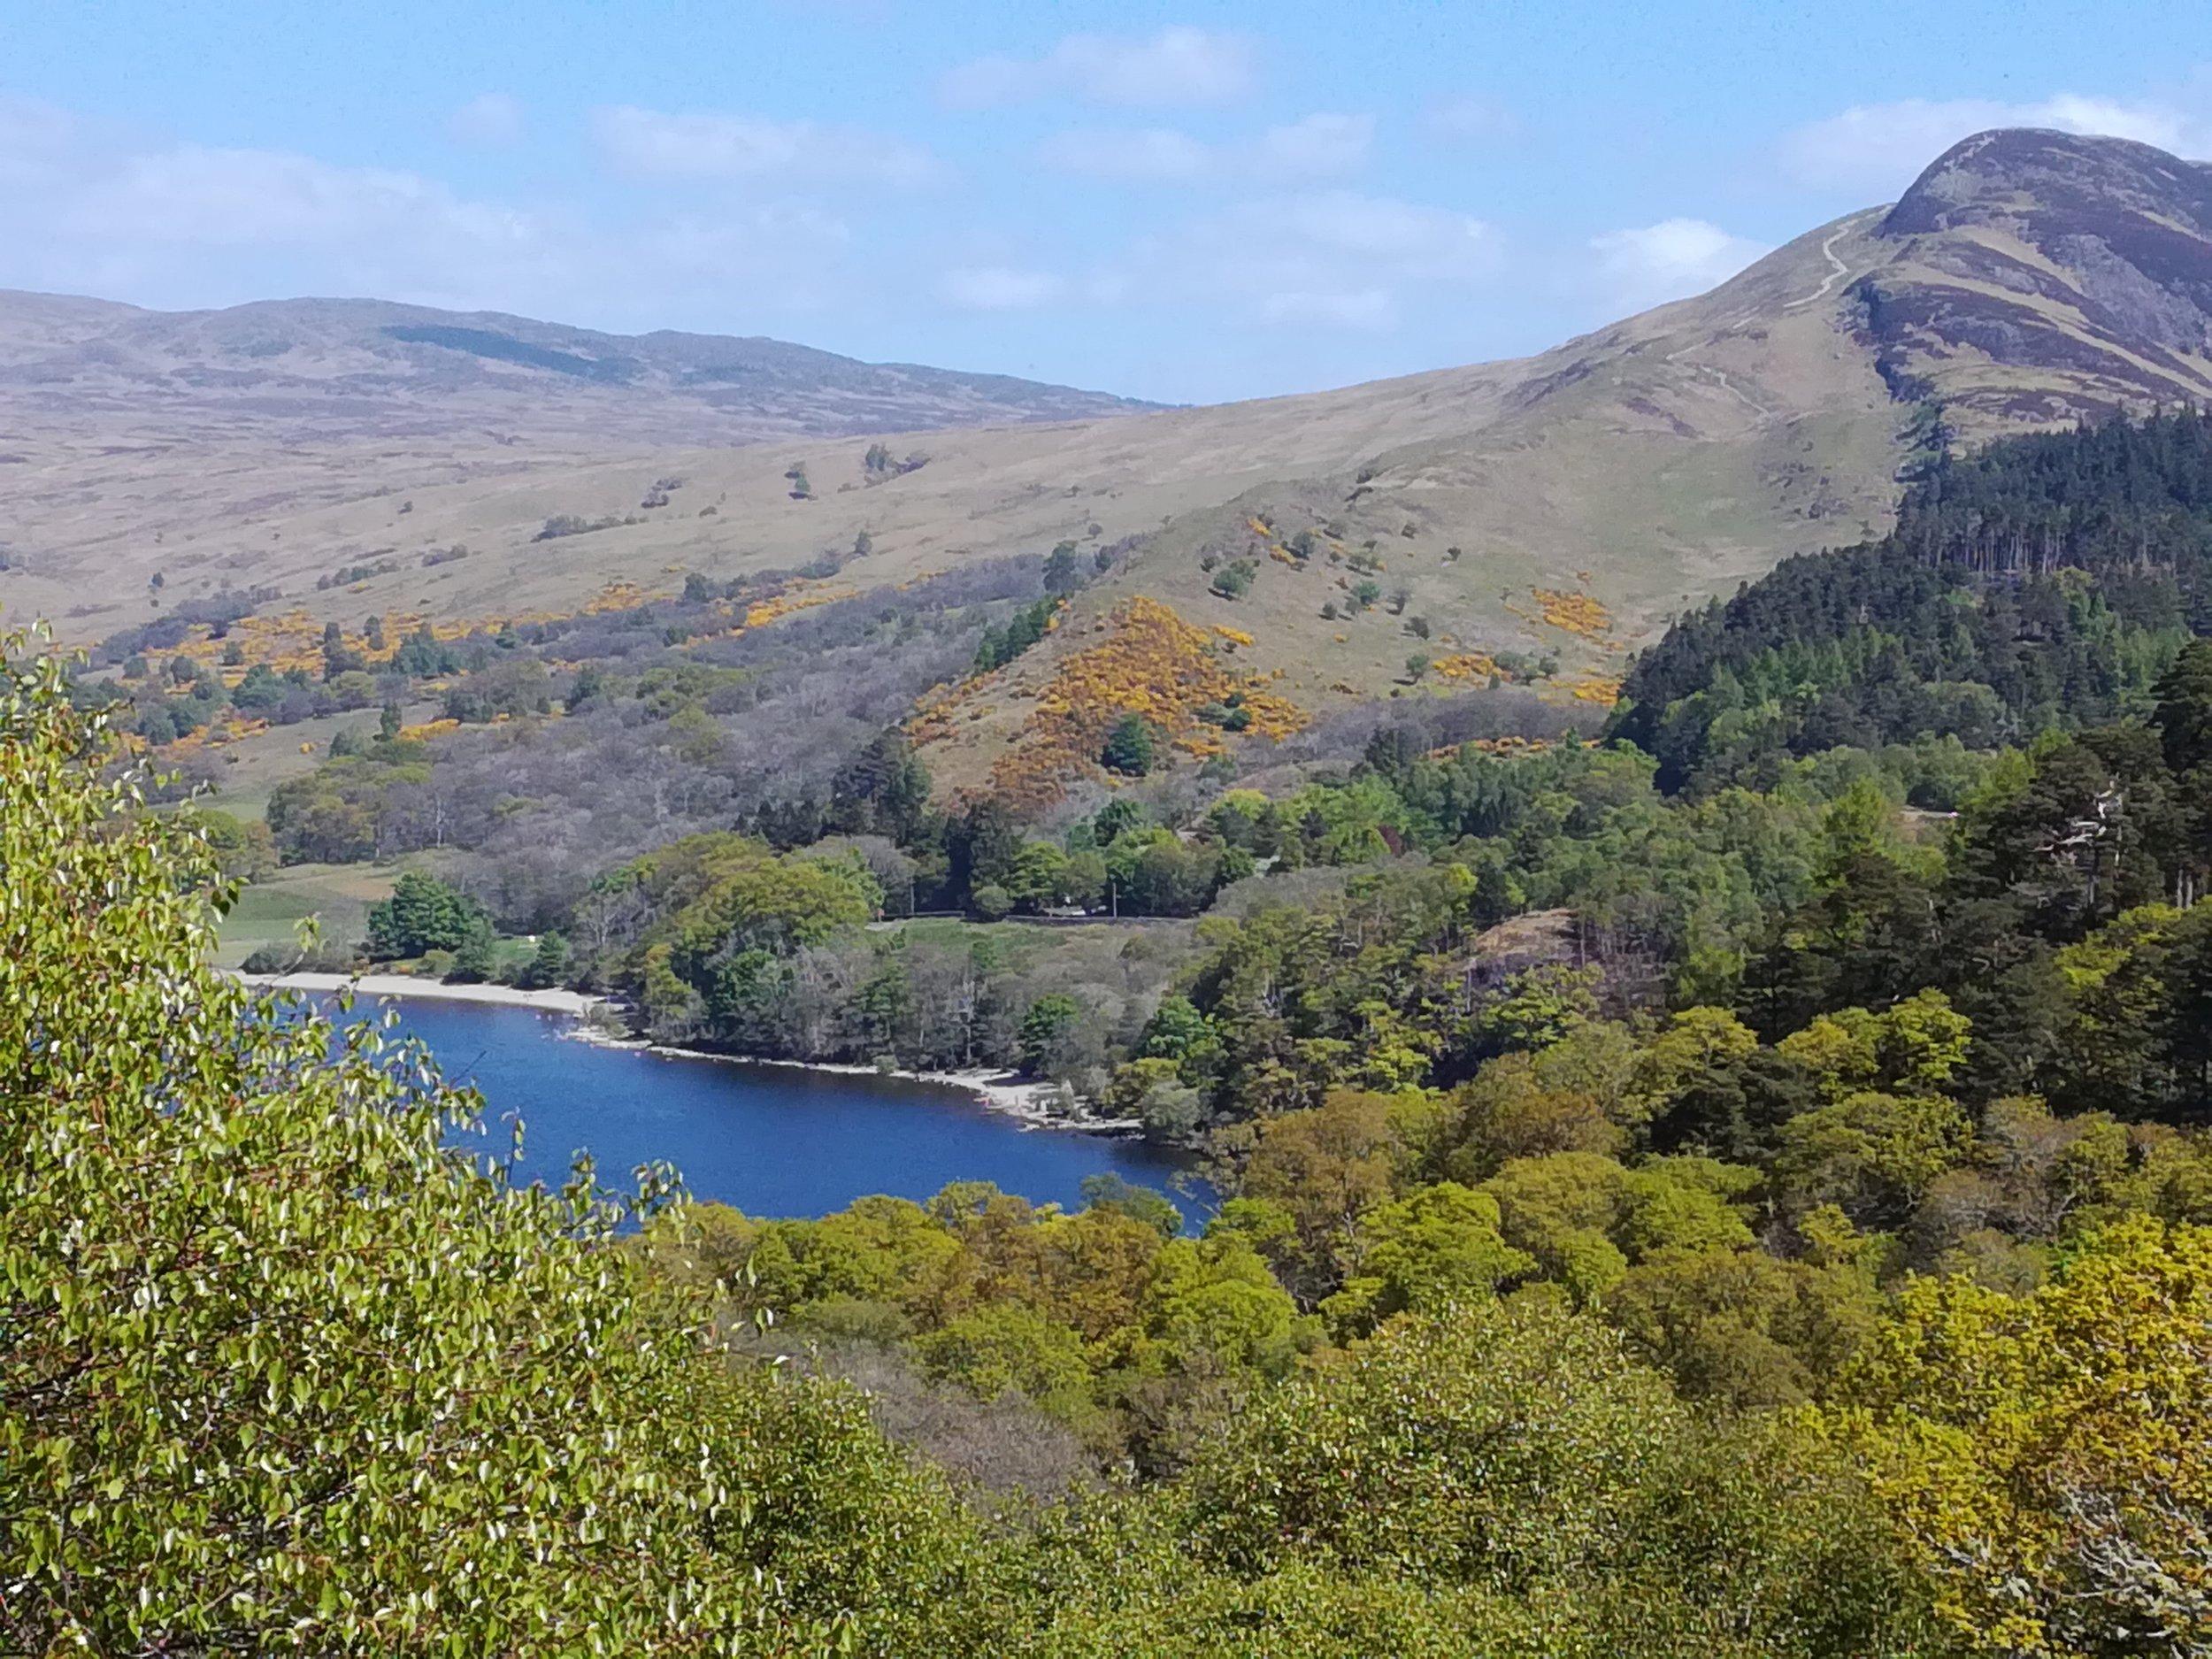 Loch Lomond, Tour & WZalk Scotland in small group adventures - Roaming Scotland. jpg